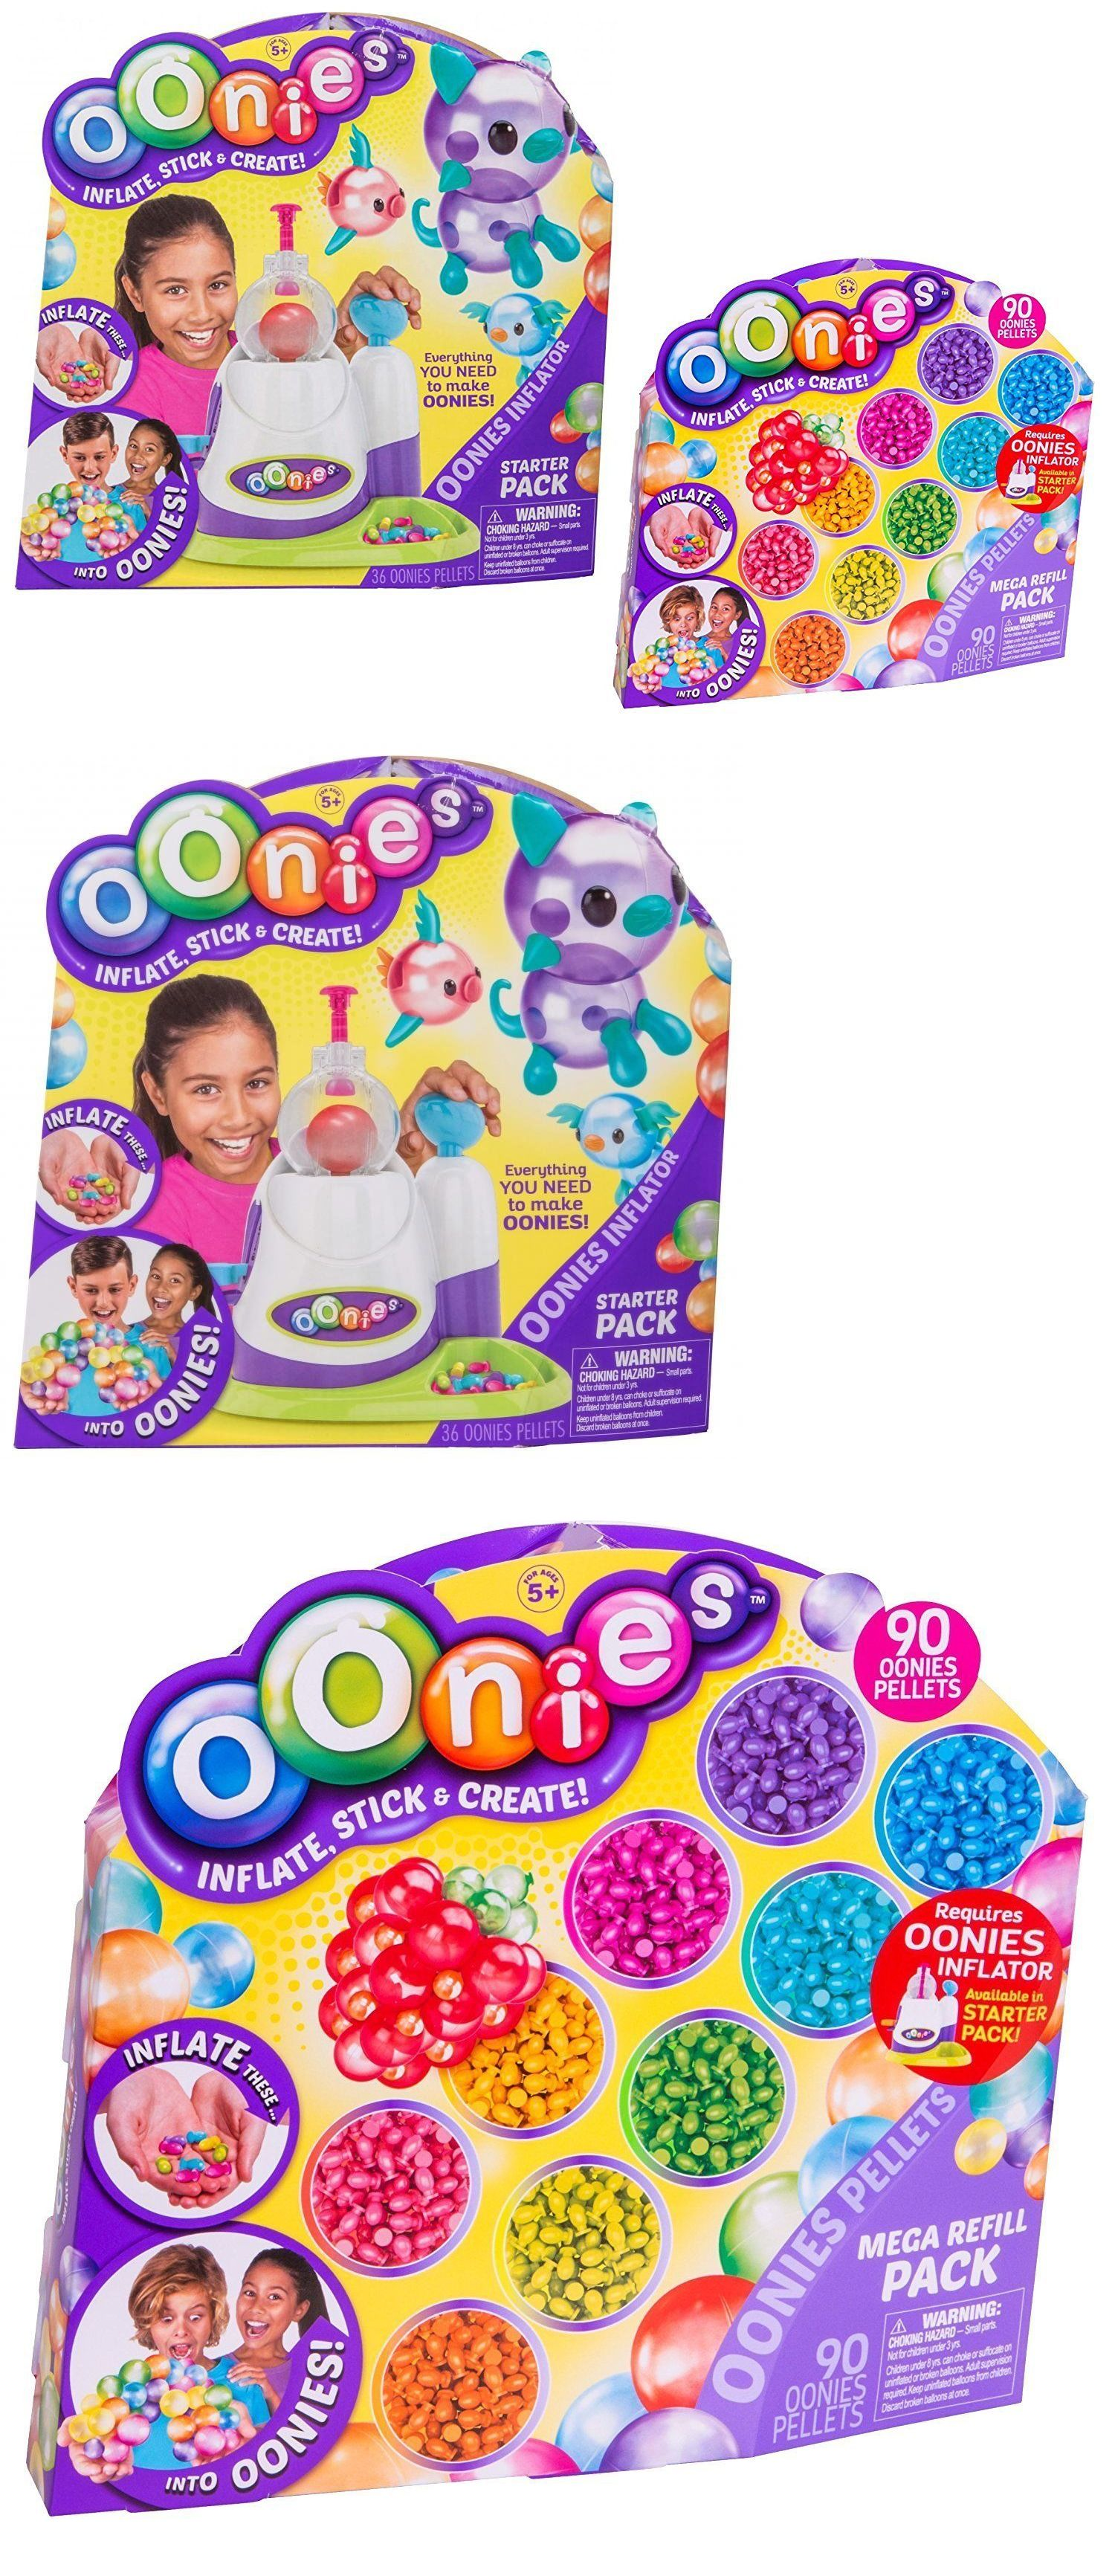 96b93237d Craft Kits 116655: Oonies Starter Pack, Multicolor Bundle With Oonies Mega  Refill Pack -> BUY IT NOW ONLY: $79.99 on eBay!